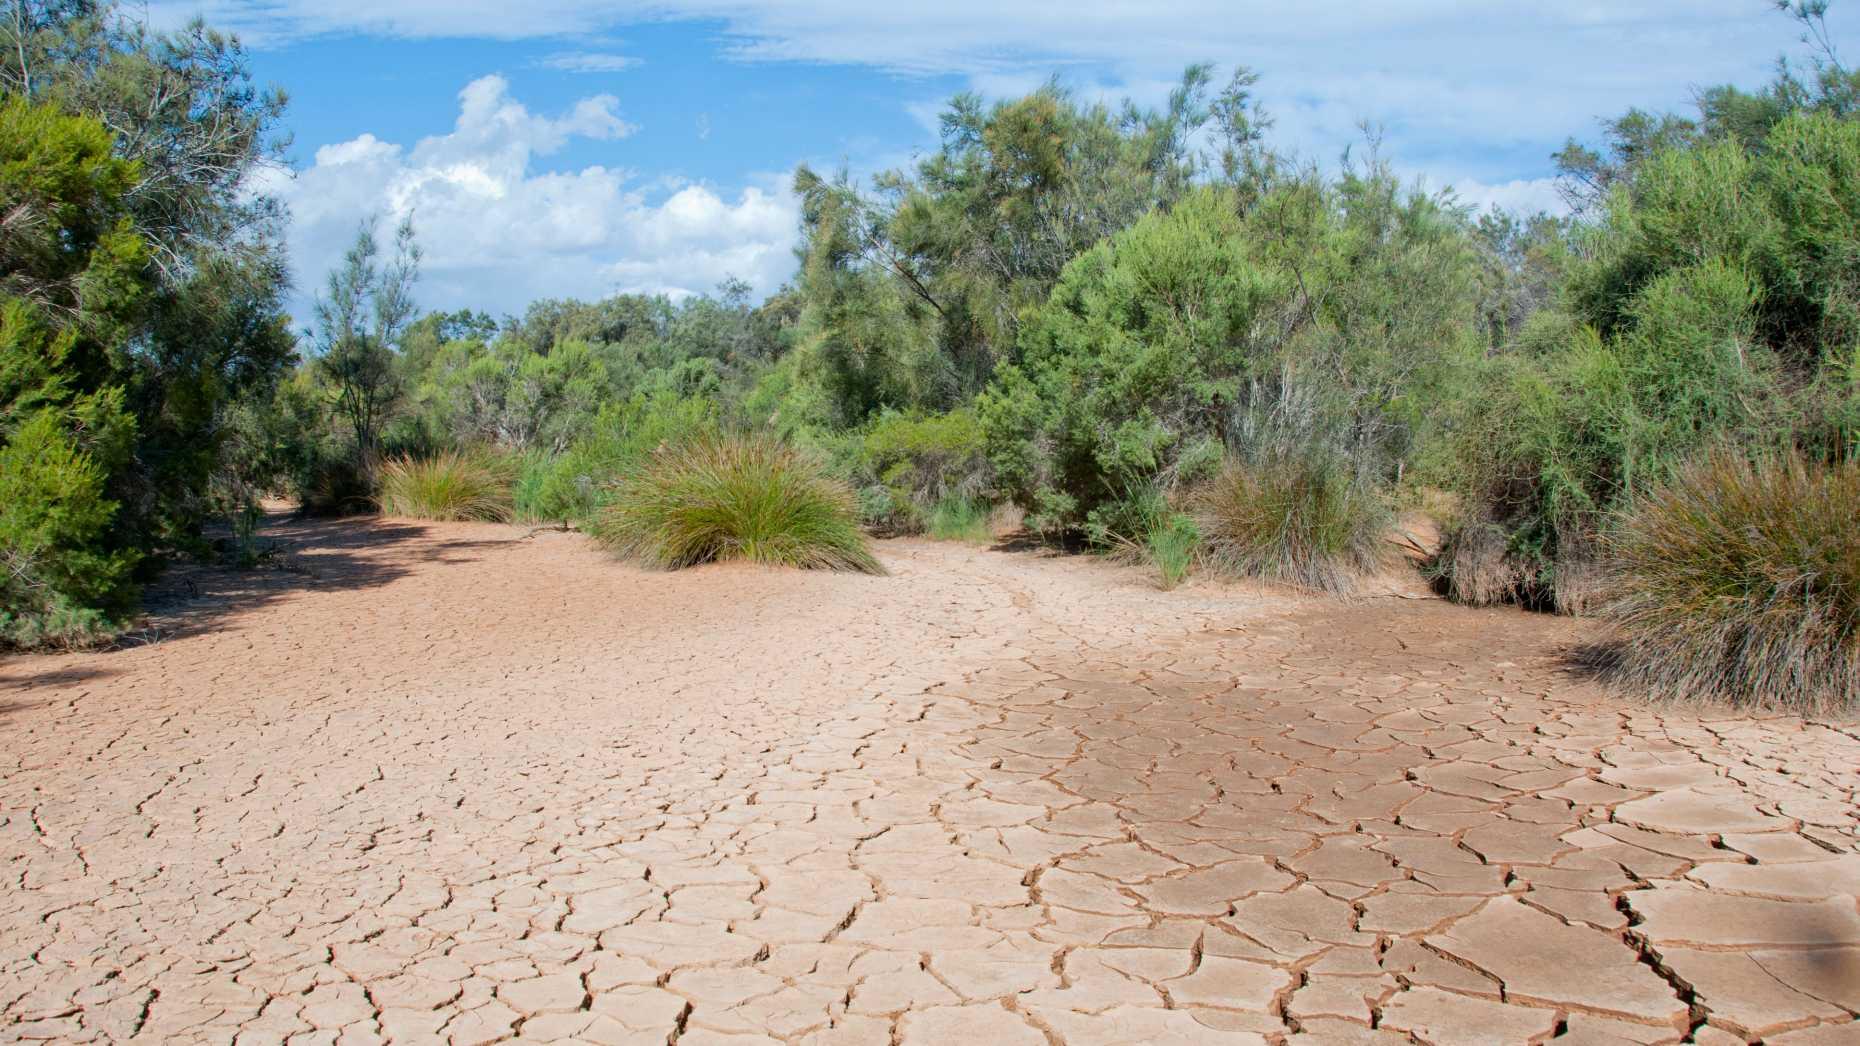 Trockenheit stresst Ökosysteme